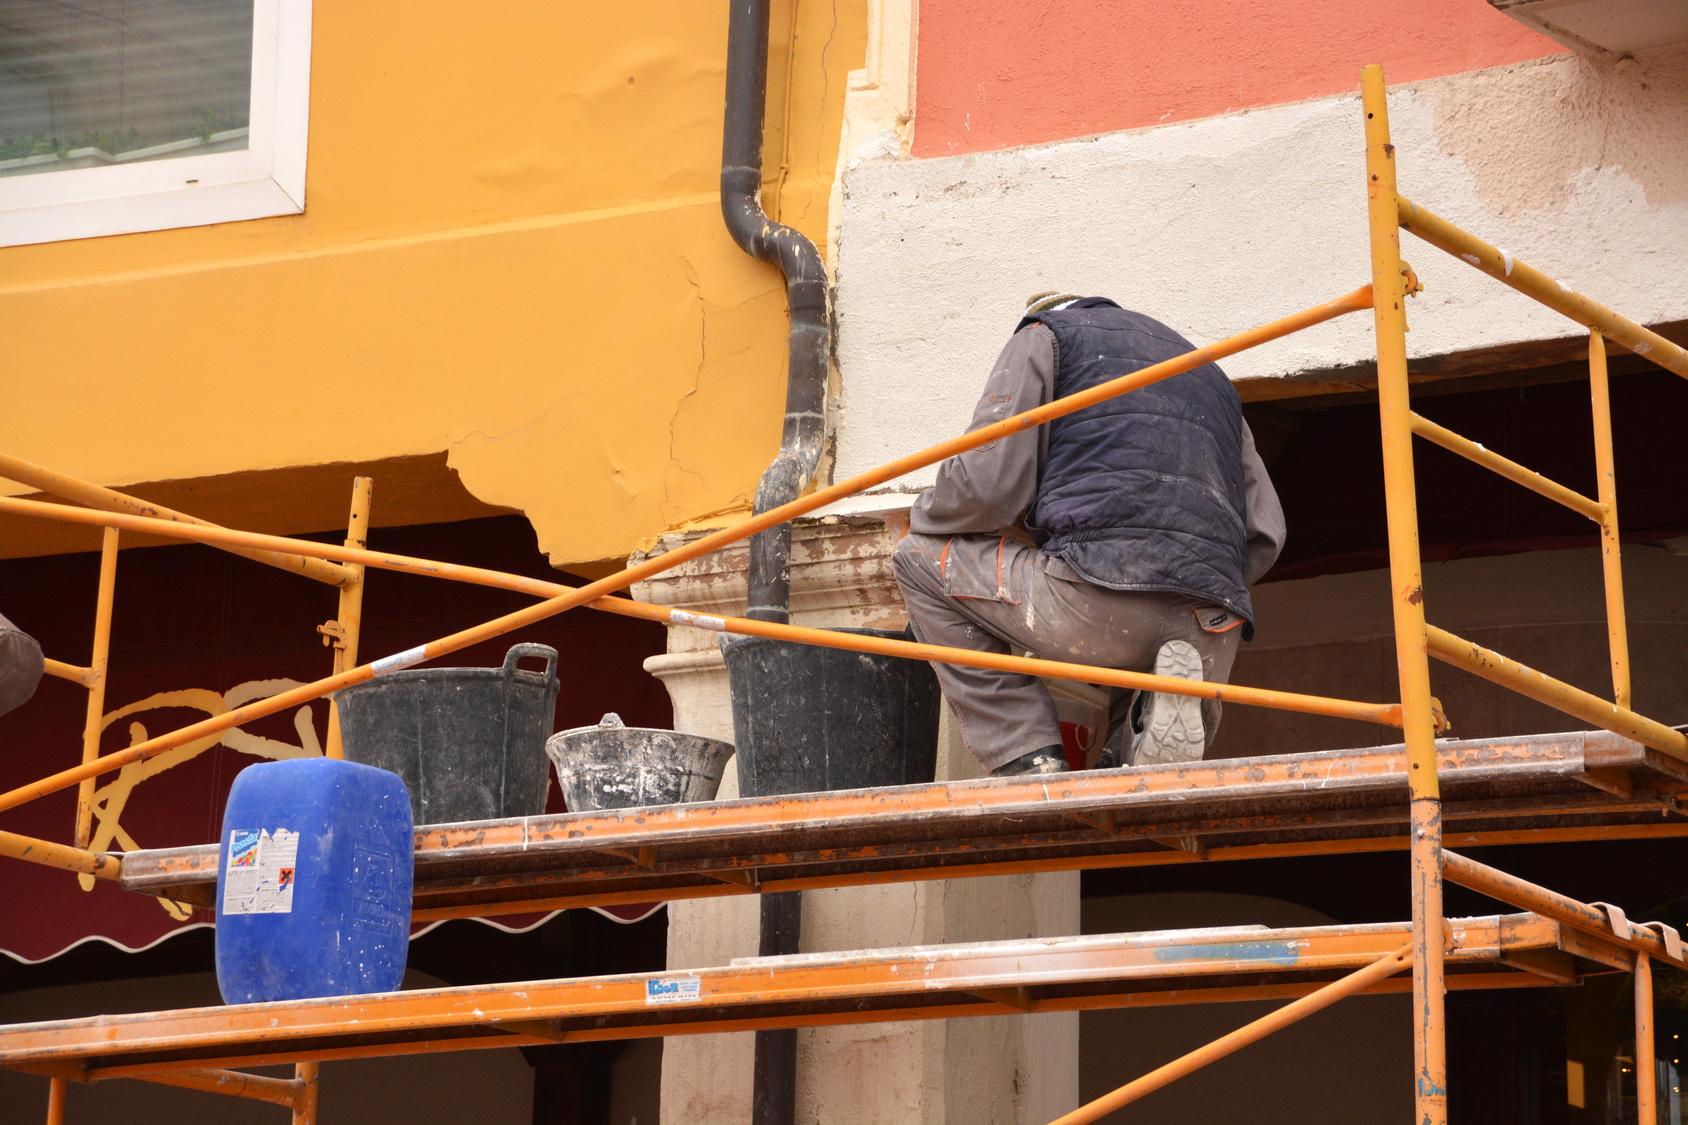 peindre sa facade soi meme choisir la bonne couleur de peinture with peindre sa facade soi meme. Black Bedroom Furniture Sets. Home Design Ideas